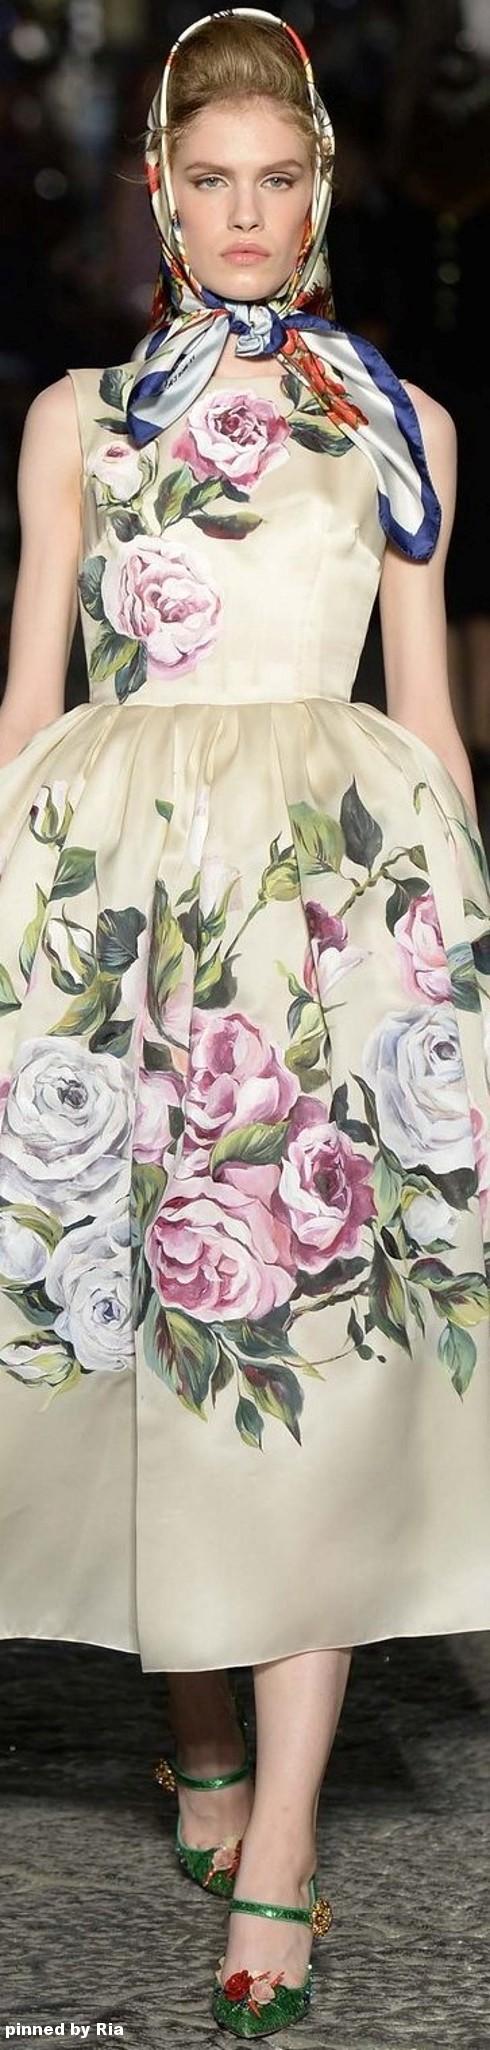 Dolce & Gabbana Alta Moda Fall 2016 l Ria